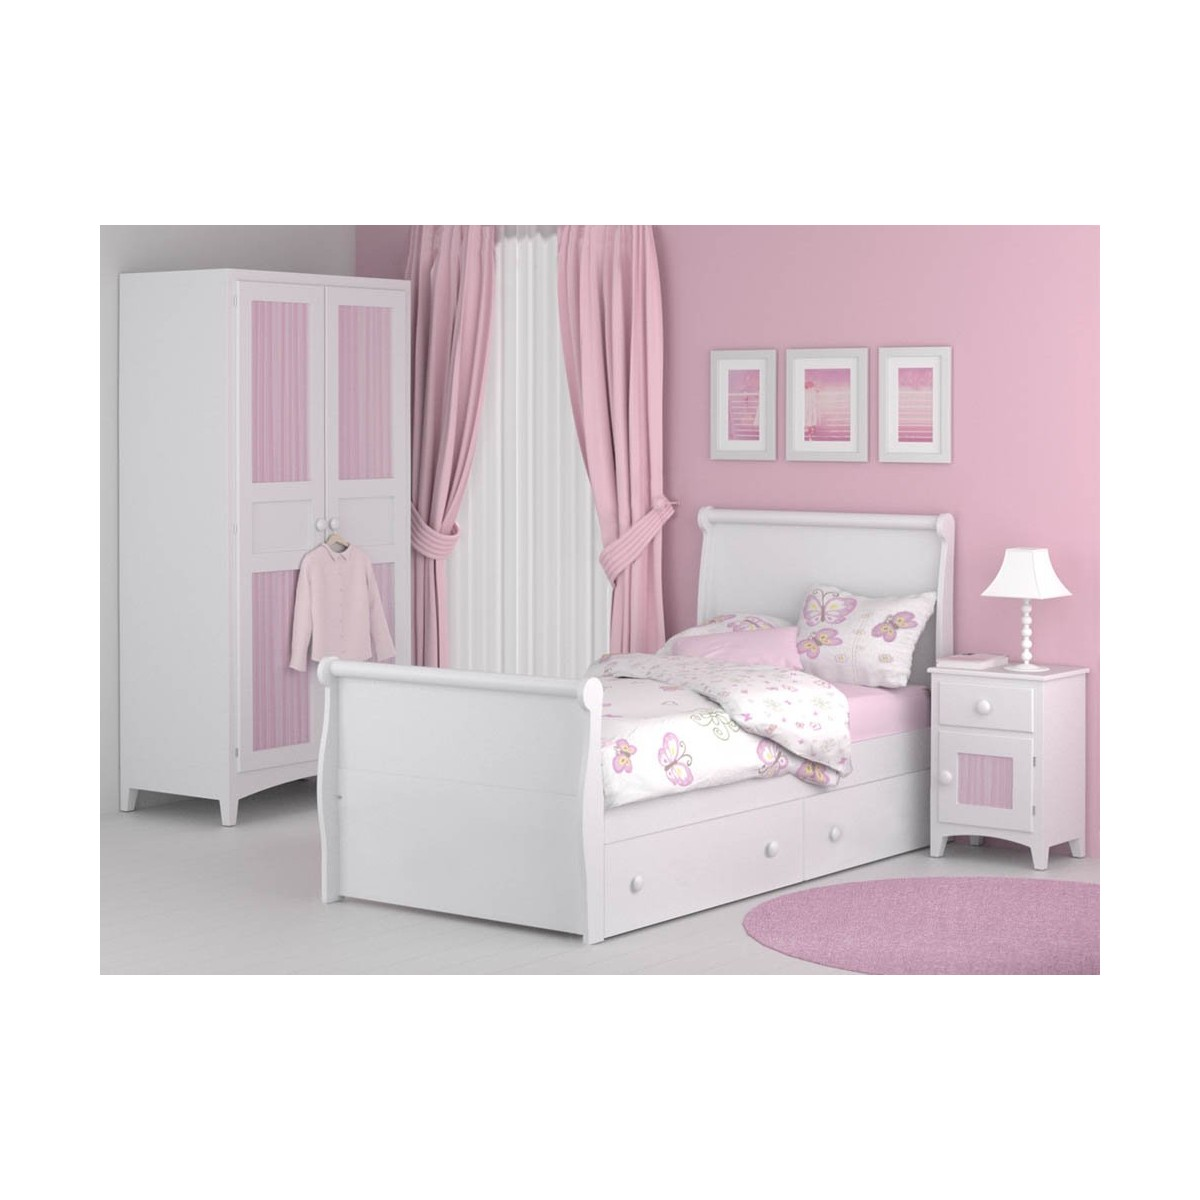 cama infantil diana con cajones